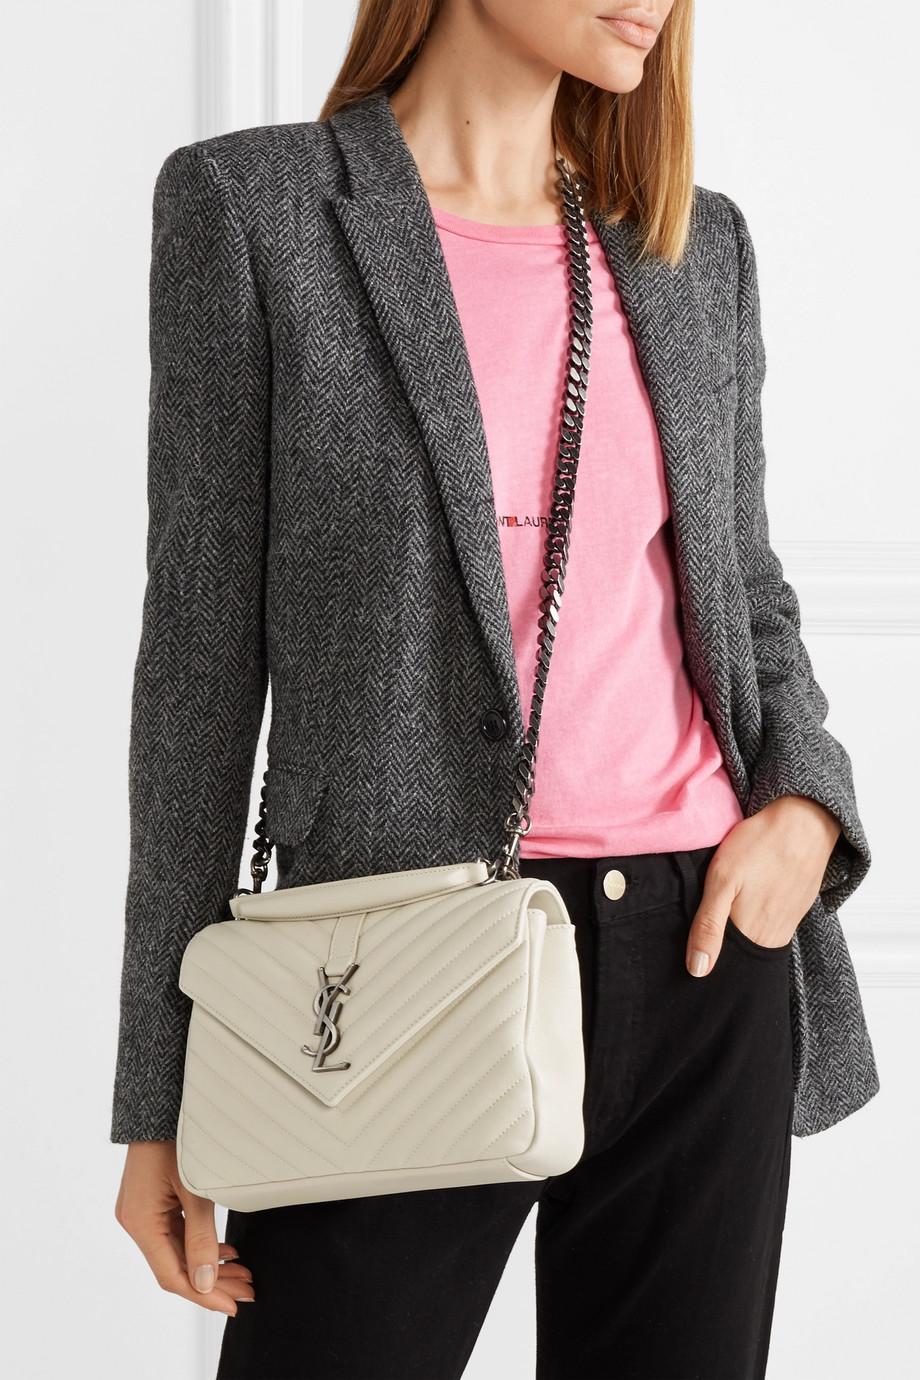 9ec726d9b5ca Saint Laurent College medium quilted leather shoulder bag